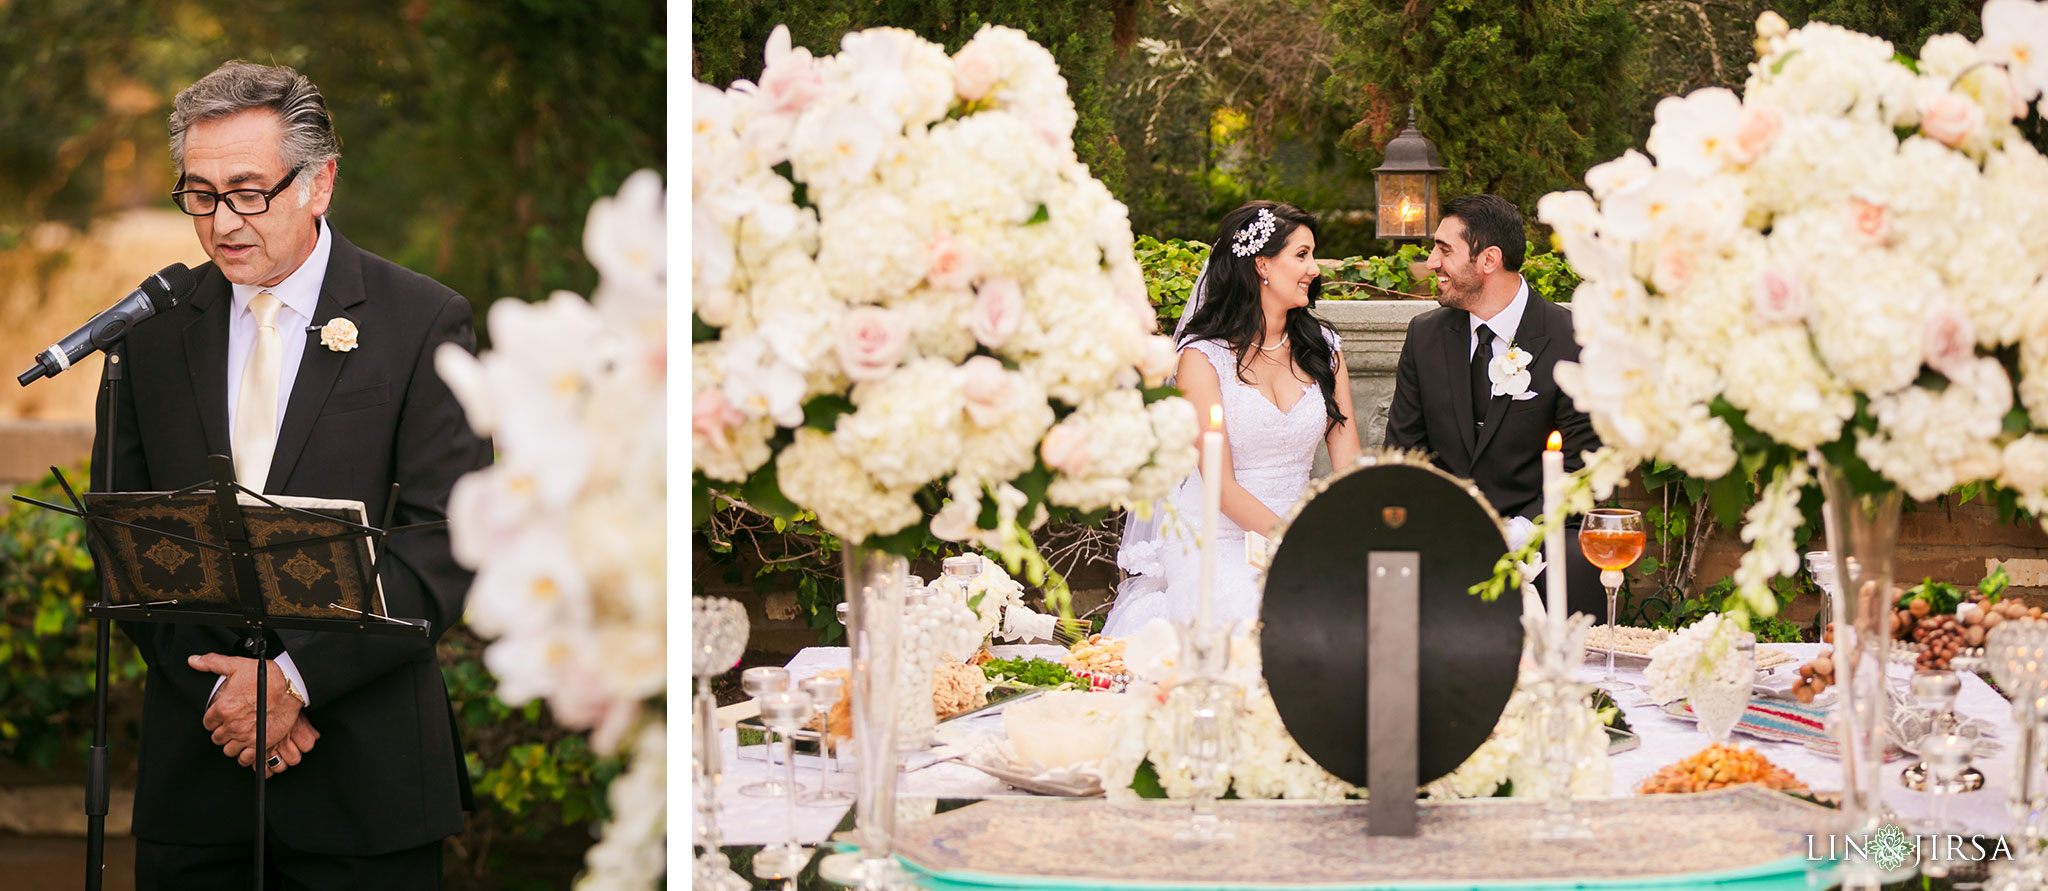 033 estancia la jolla hotel spa persian sofreh wedding ceremony photography